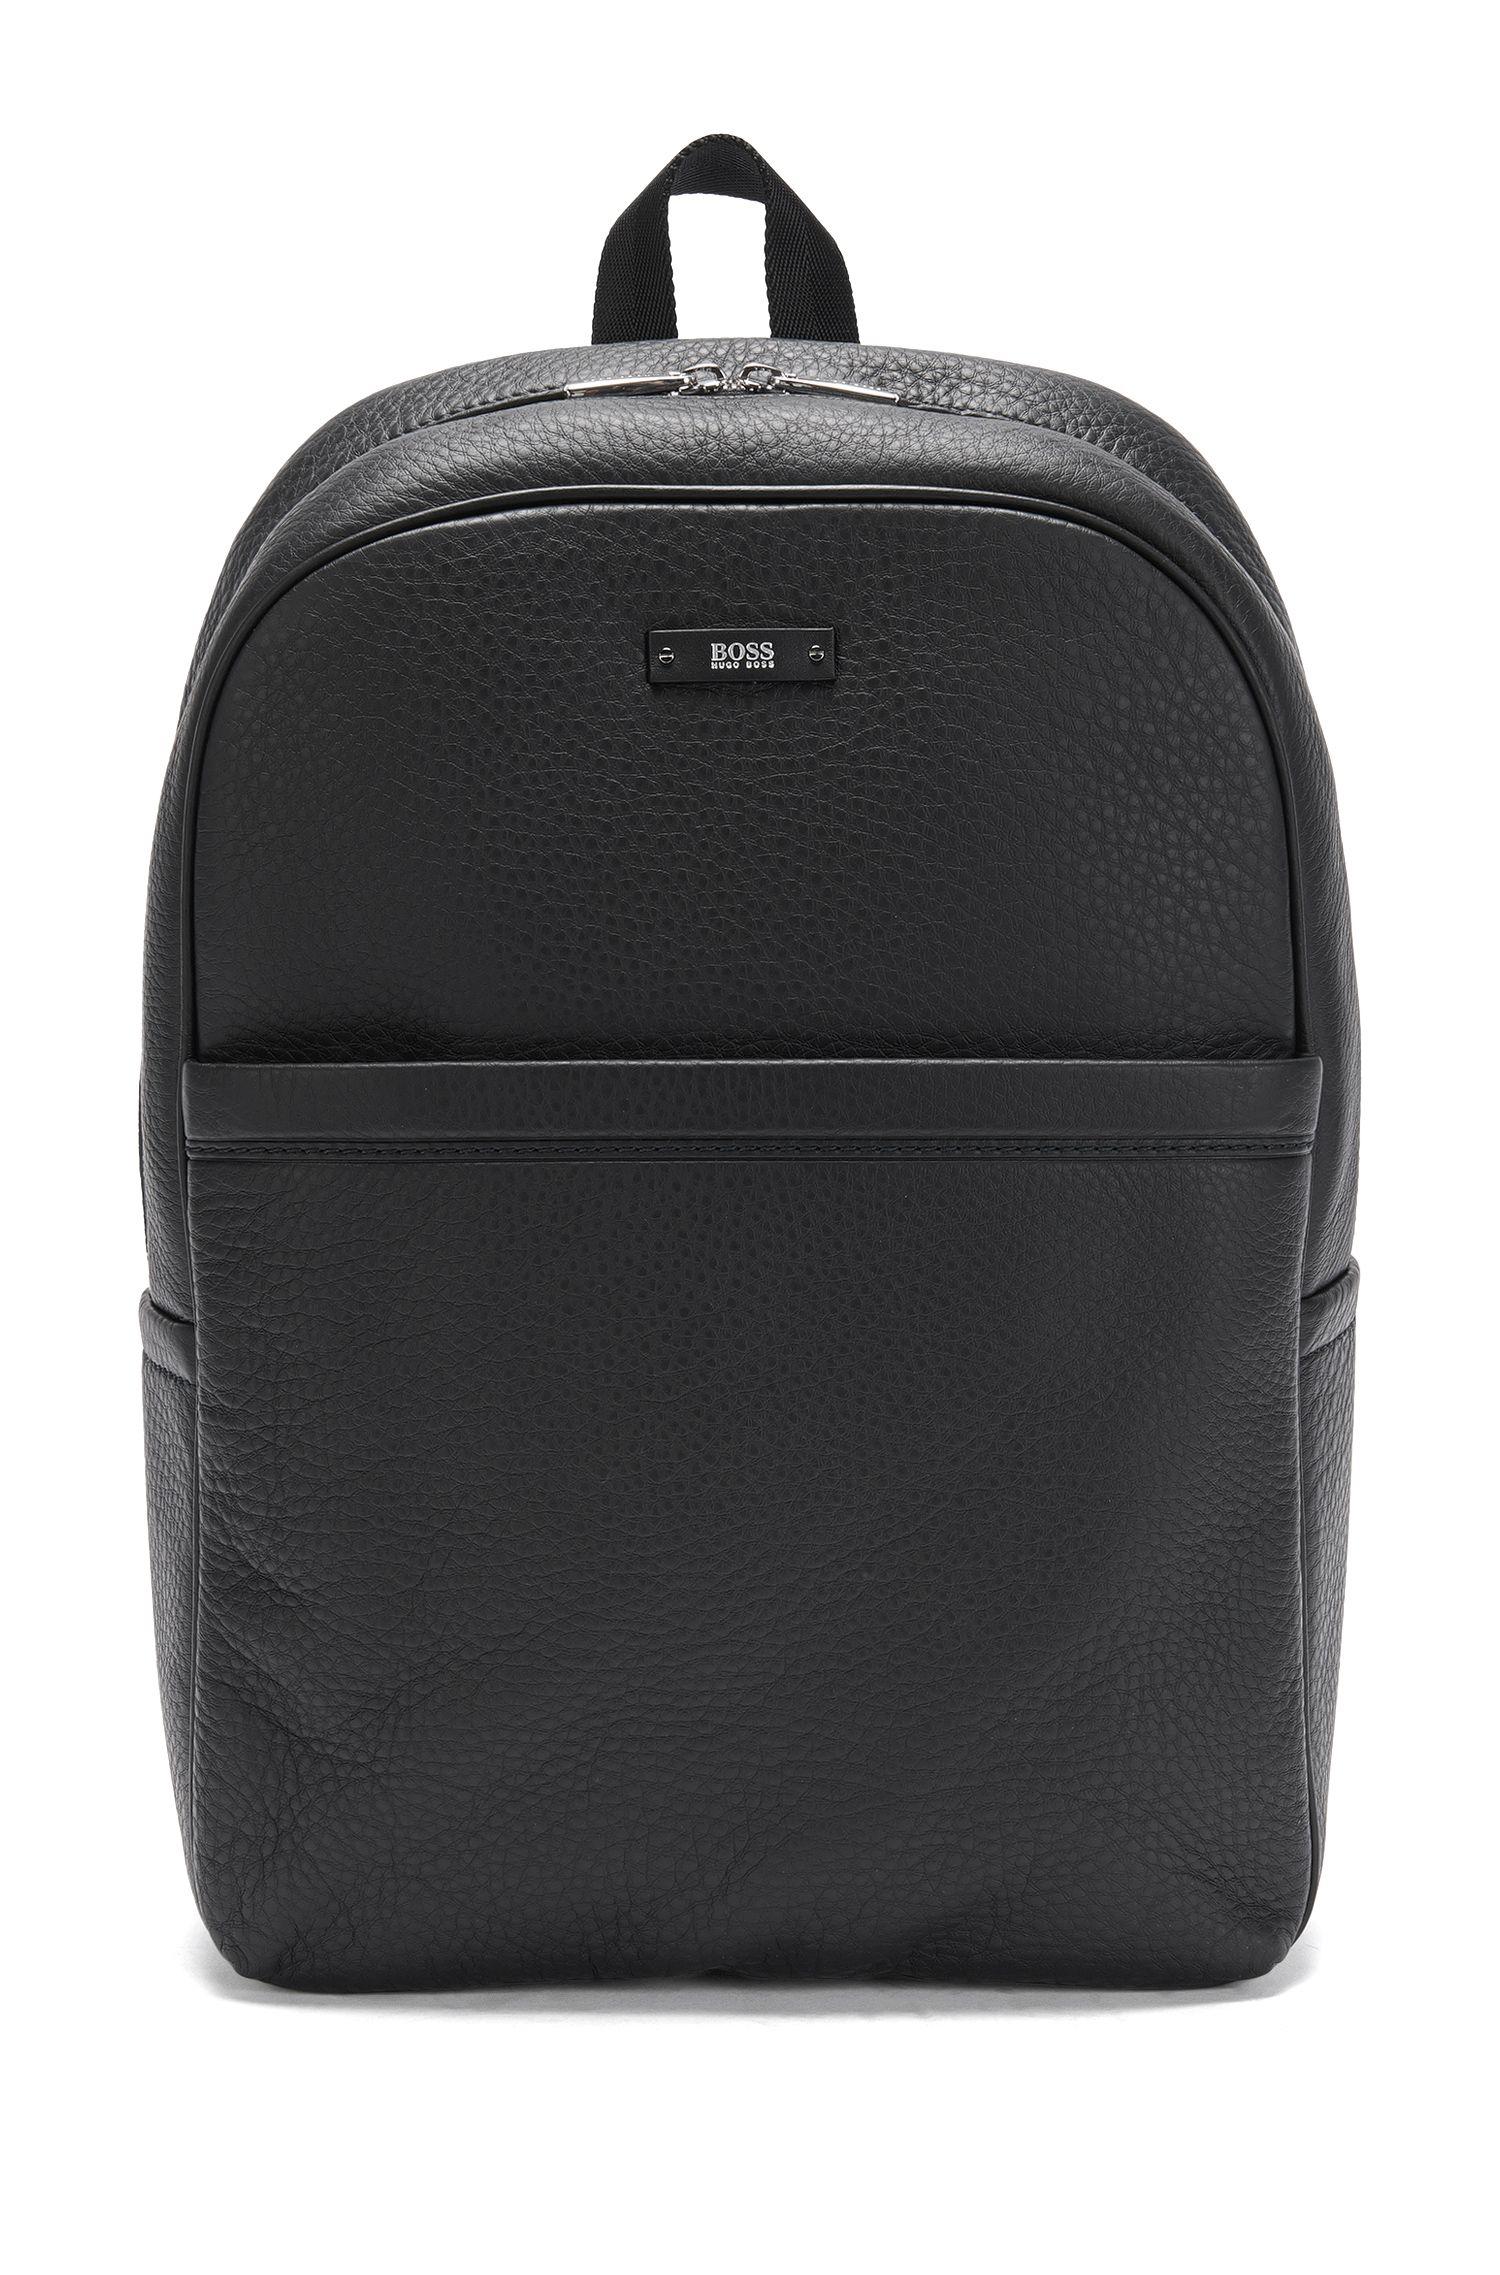 'Traveller Backp' | Textured Leather Backpack